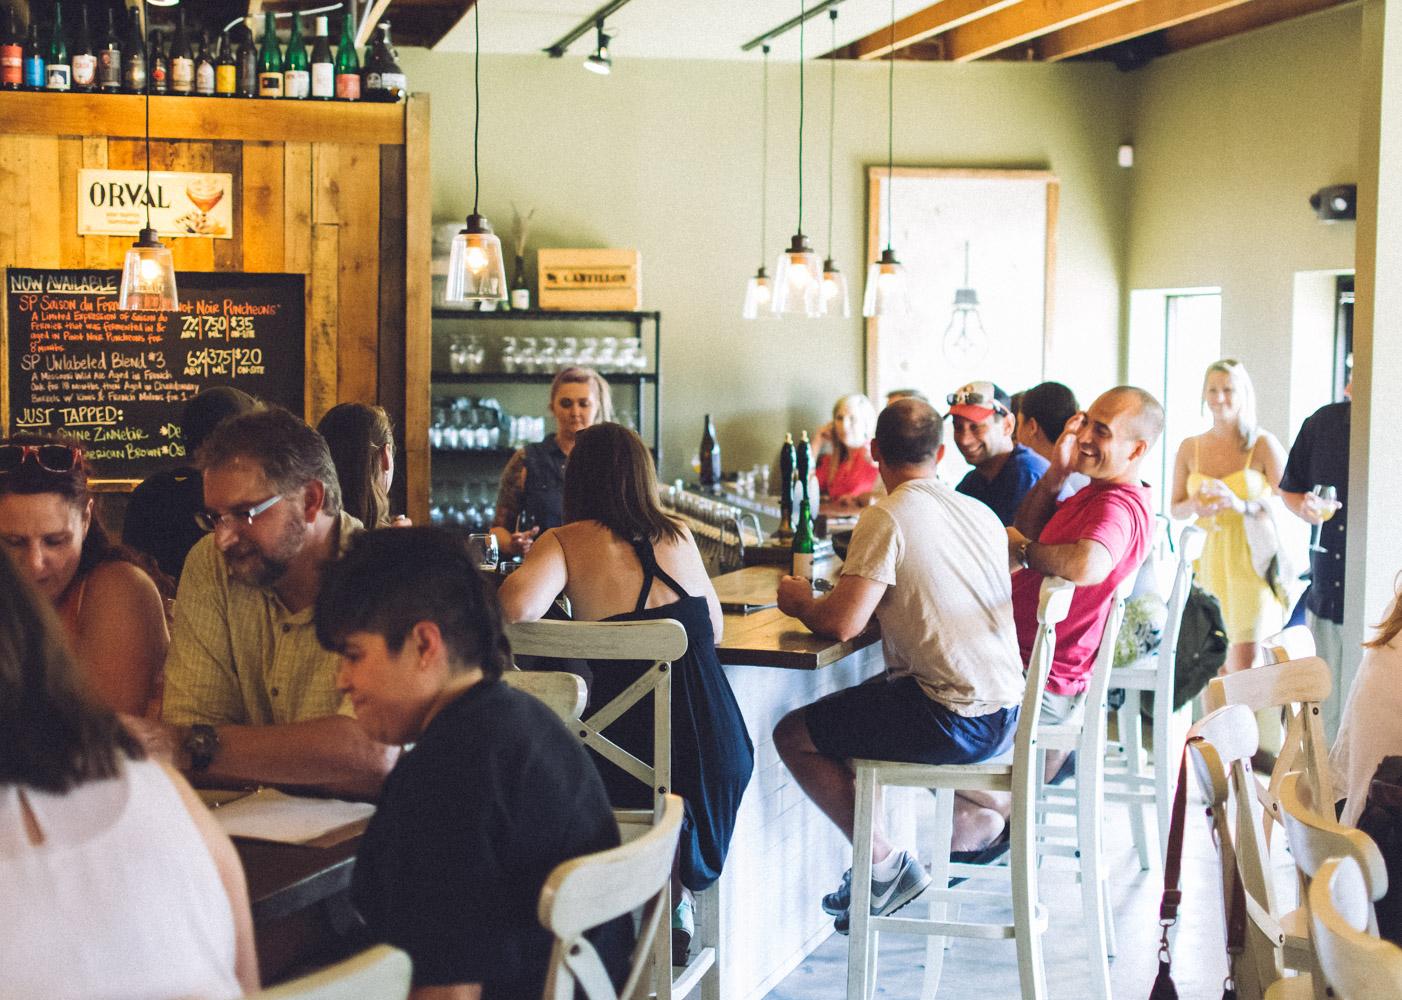 Side-Project-Cellar-St-Louis-Missouri-Sour-Beer-Matt-Sampson-Photography-Guests.jpg